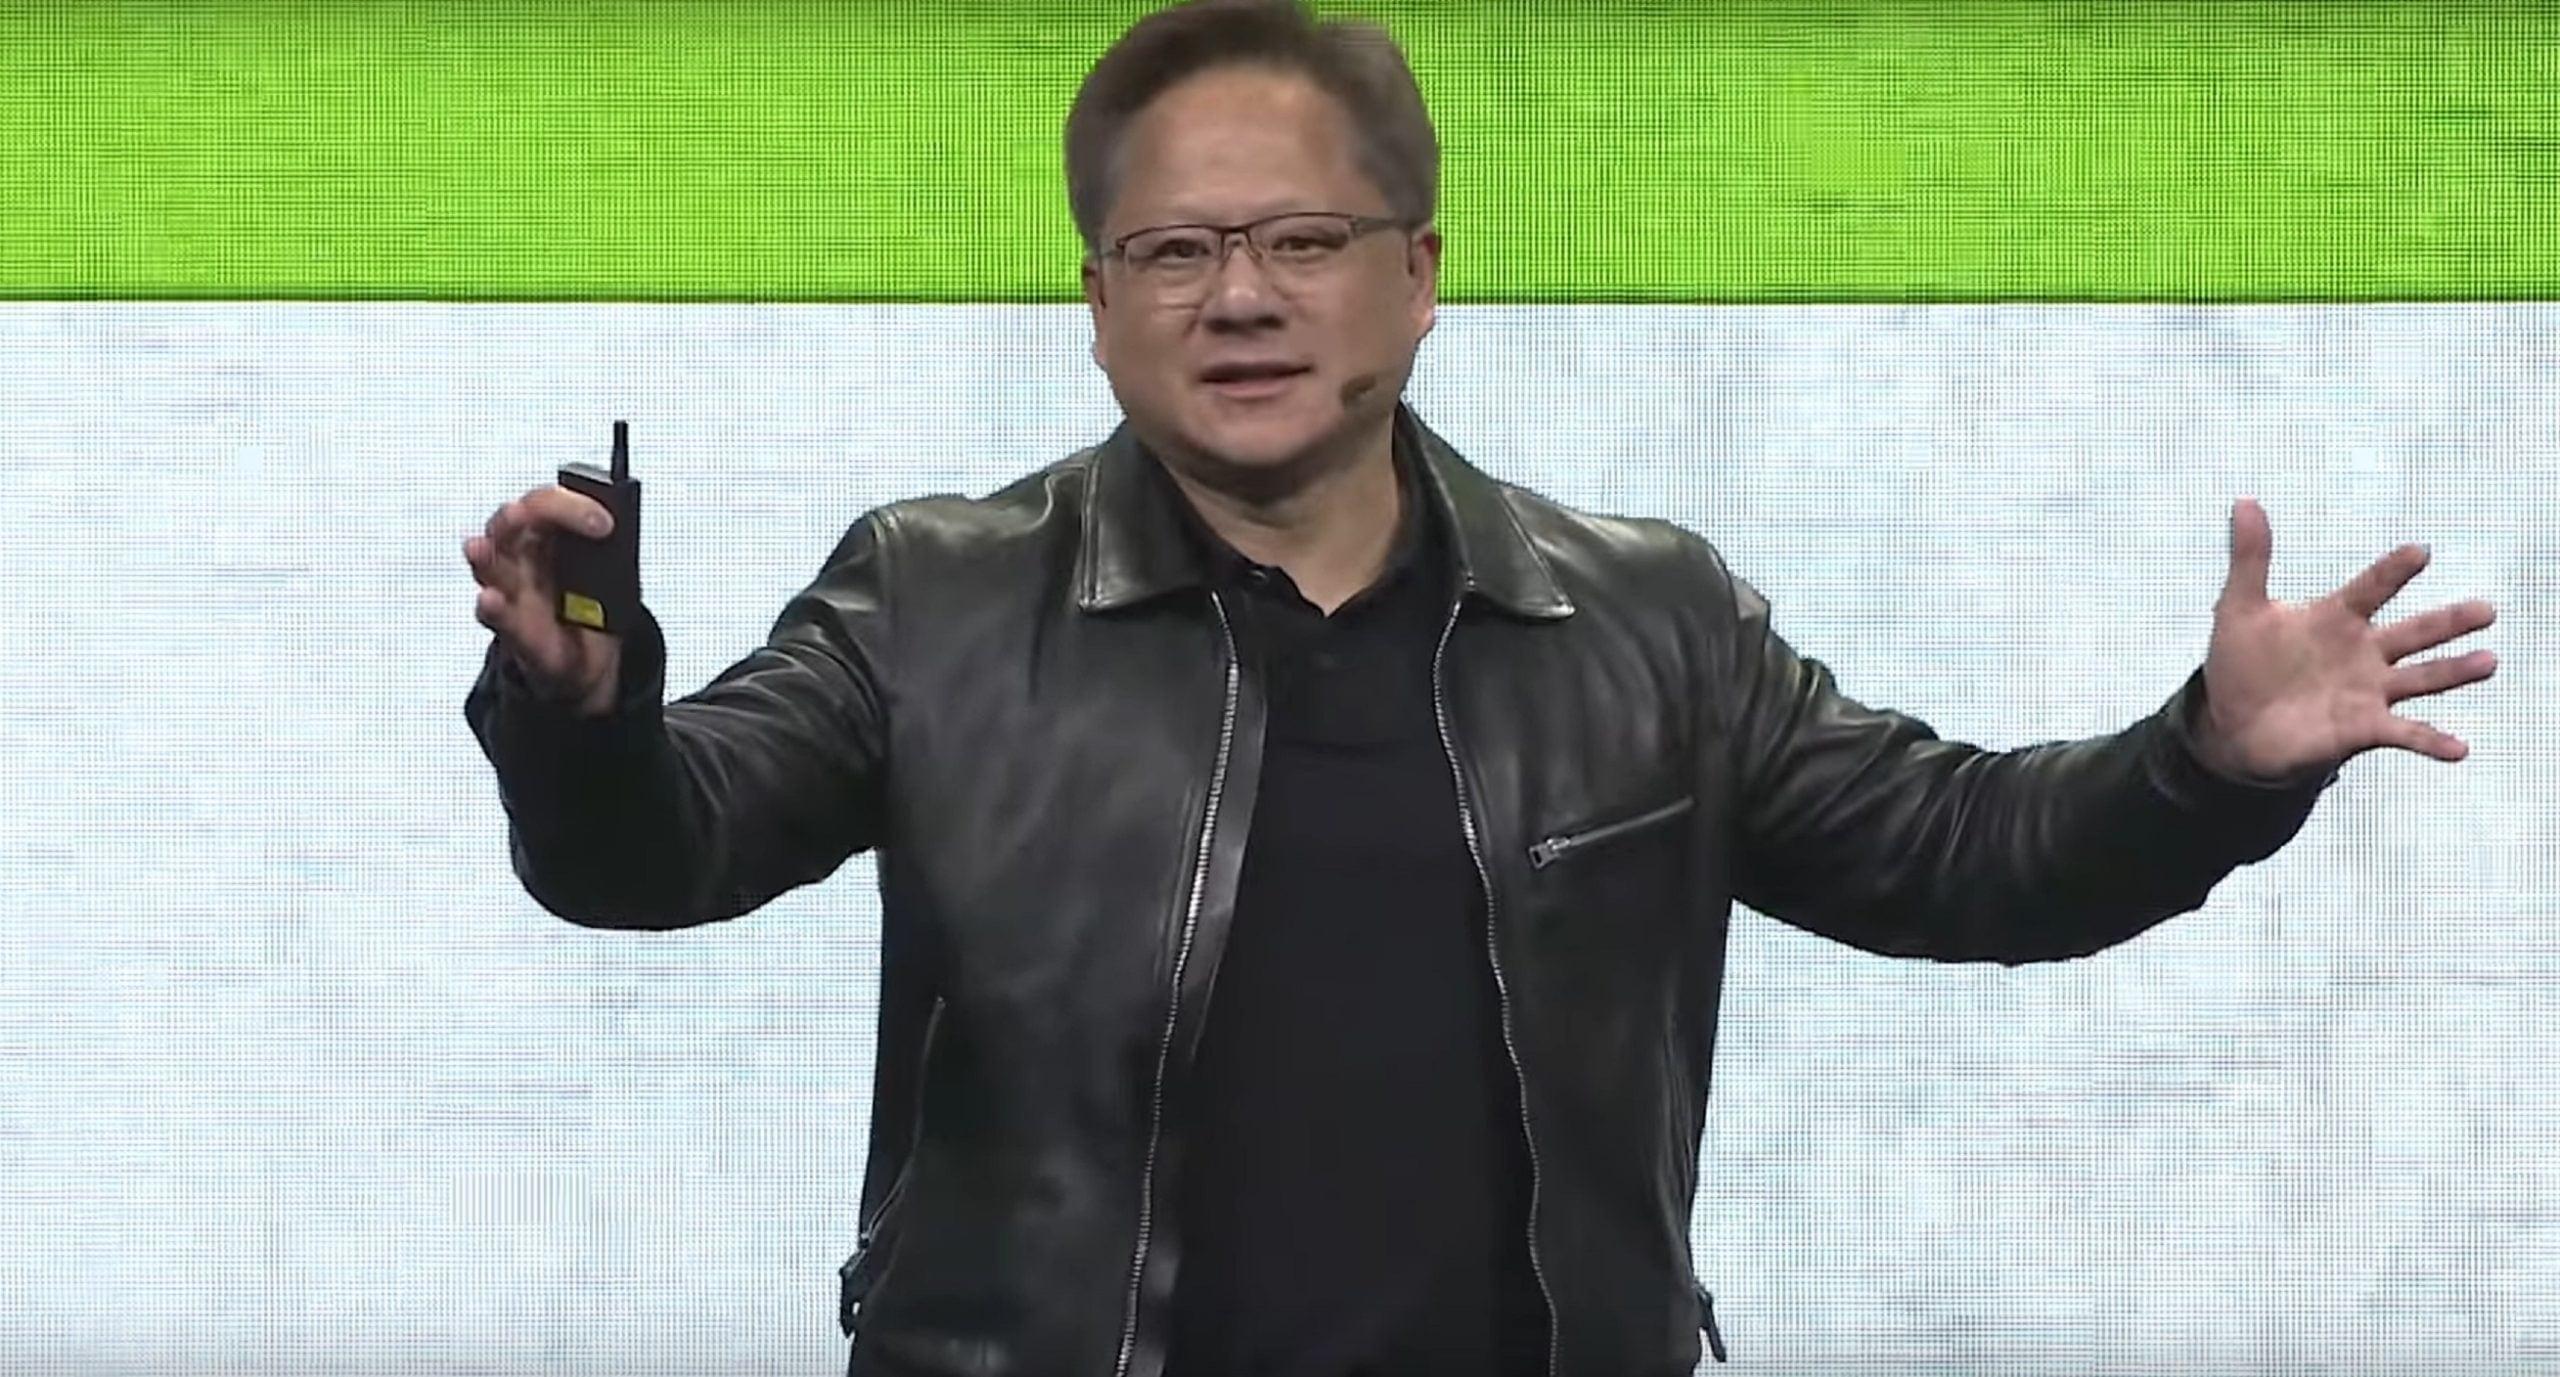 leeghoofd заполучил три золота в модельном зачете процессора AMD Phenom II X6 1090T BE